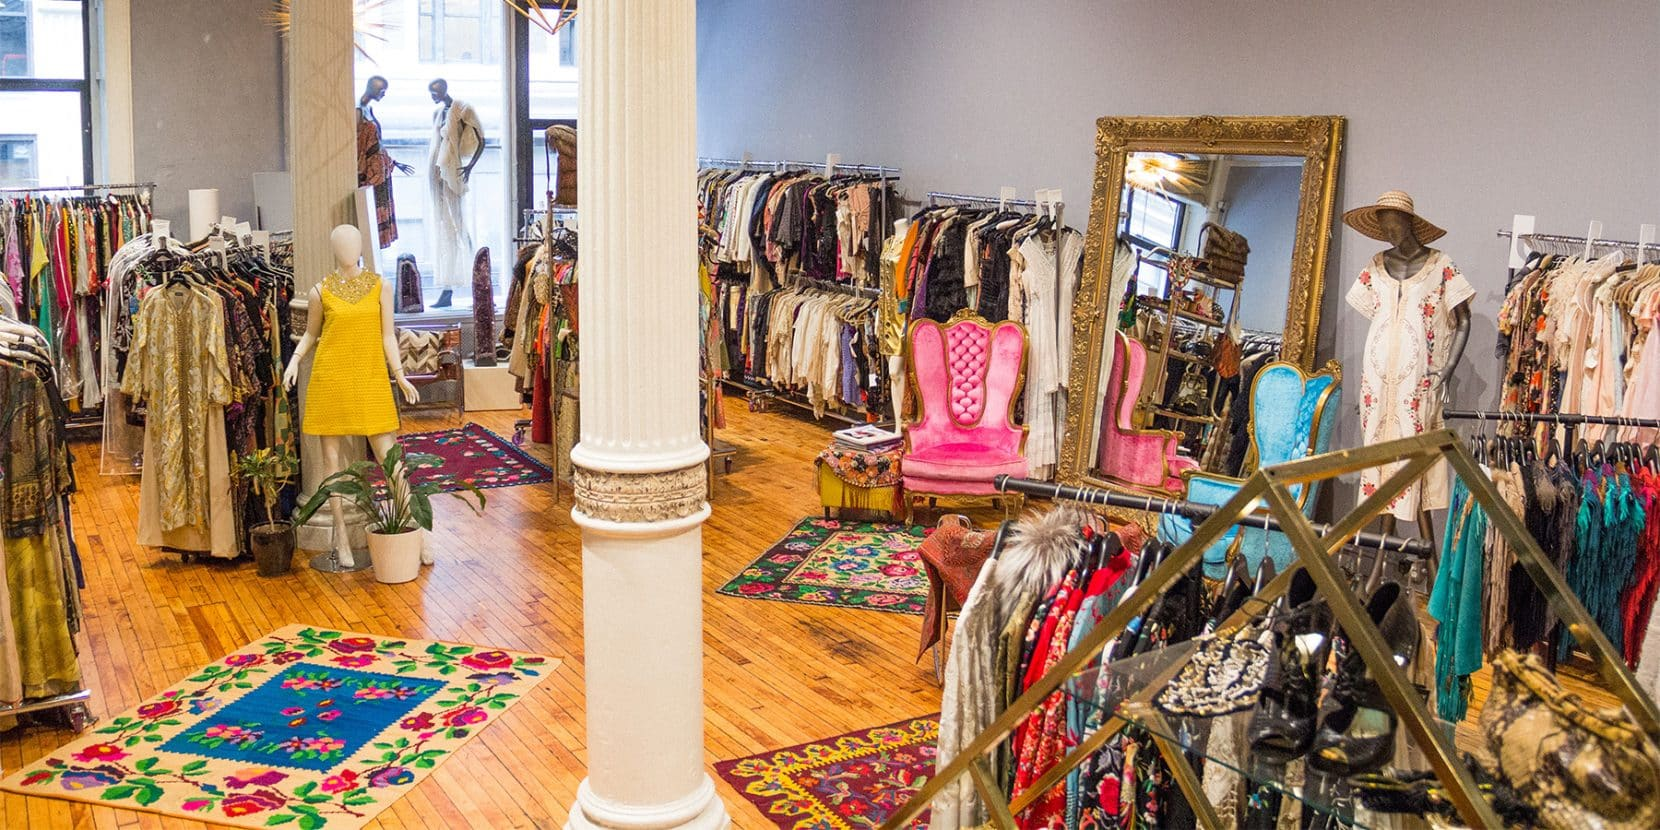 Morphew's colorful New York showroom, nestled in Manhattan's Garment District